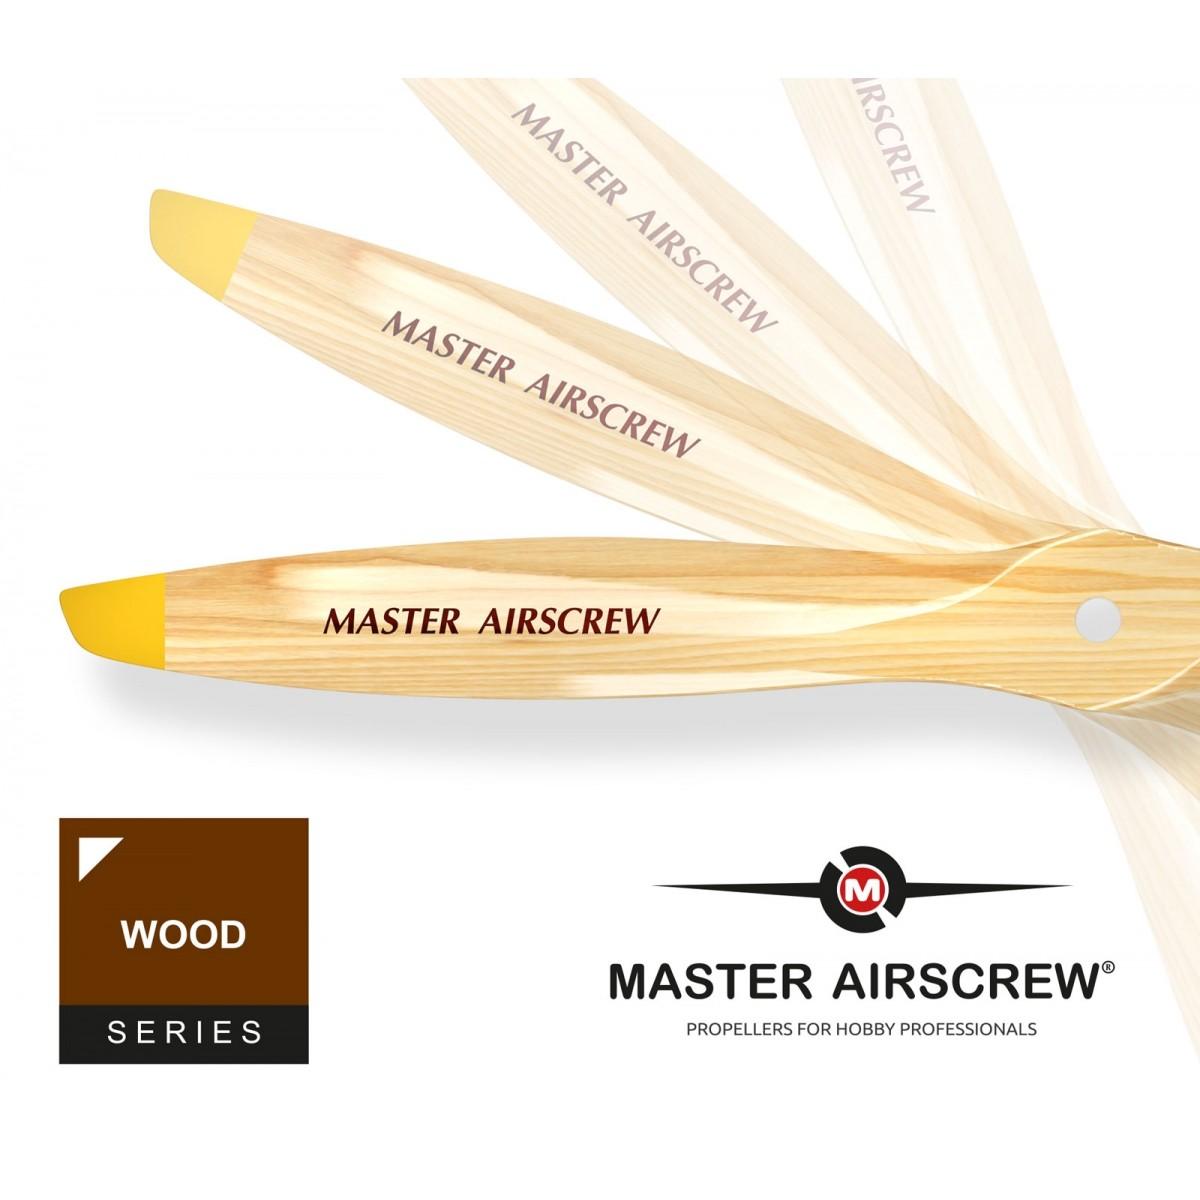 MA1180B - Hélice Master Airscrew Wood Series 11x8